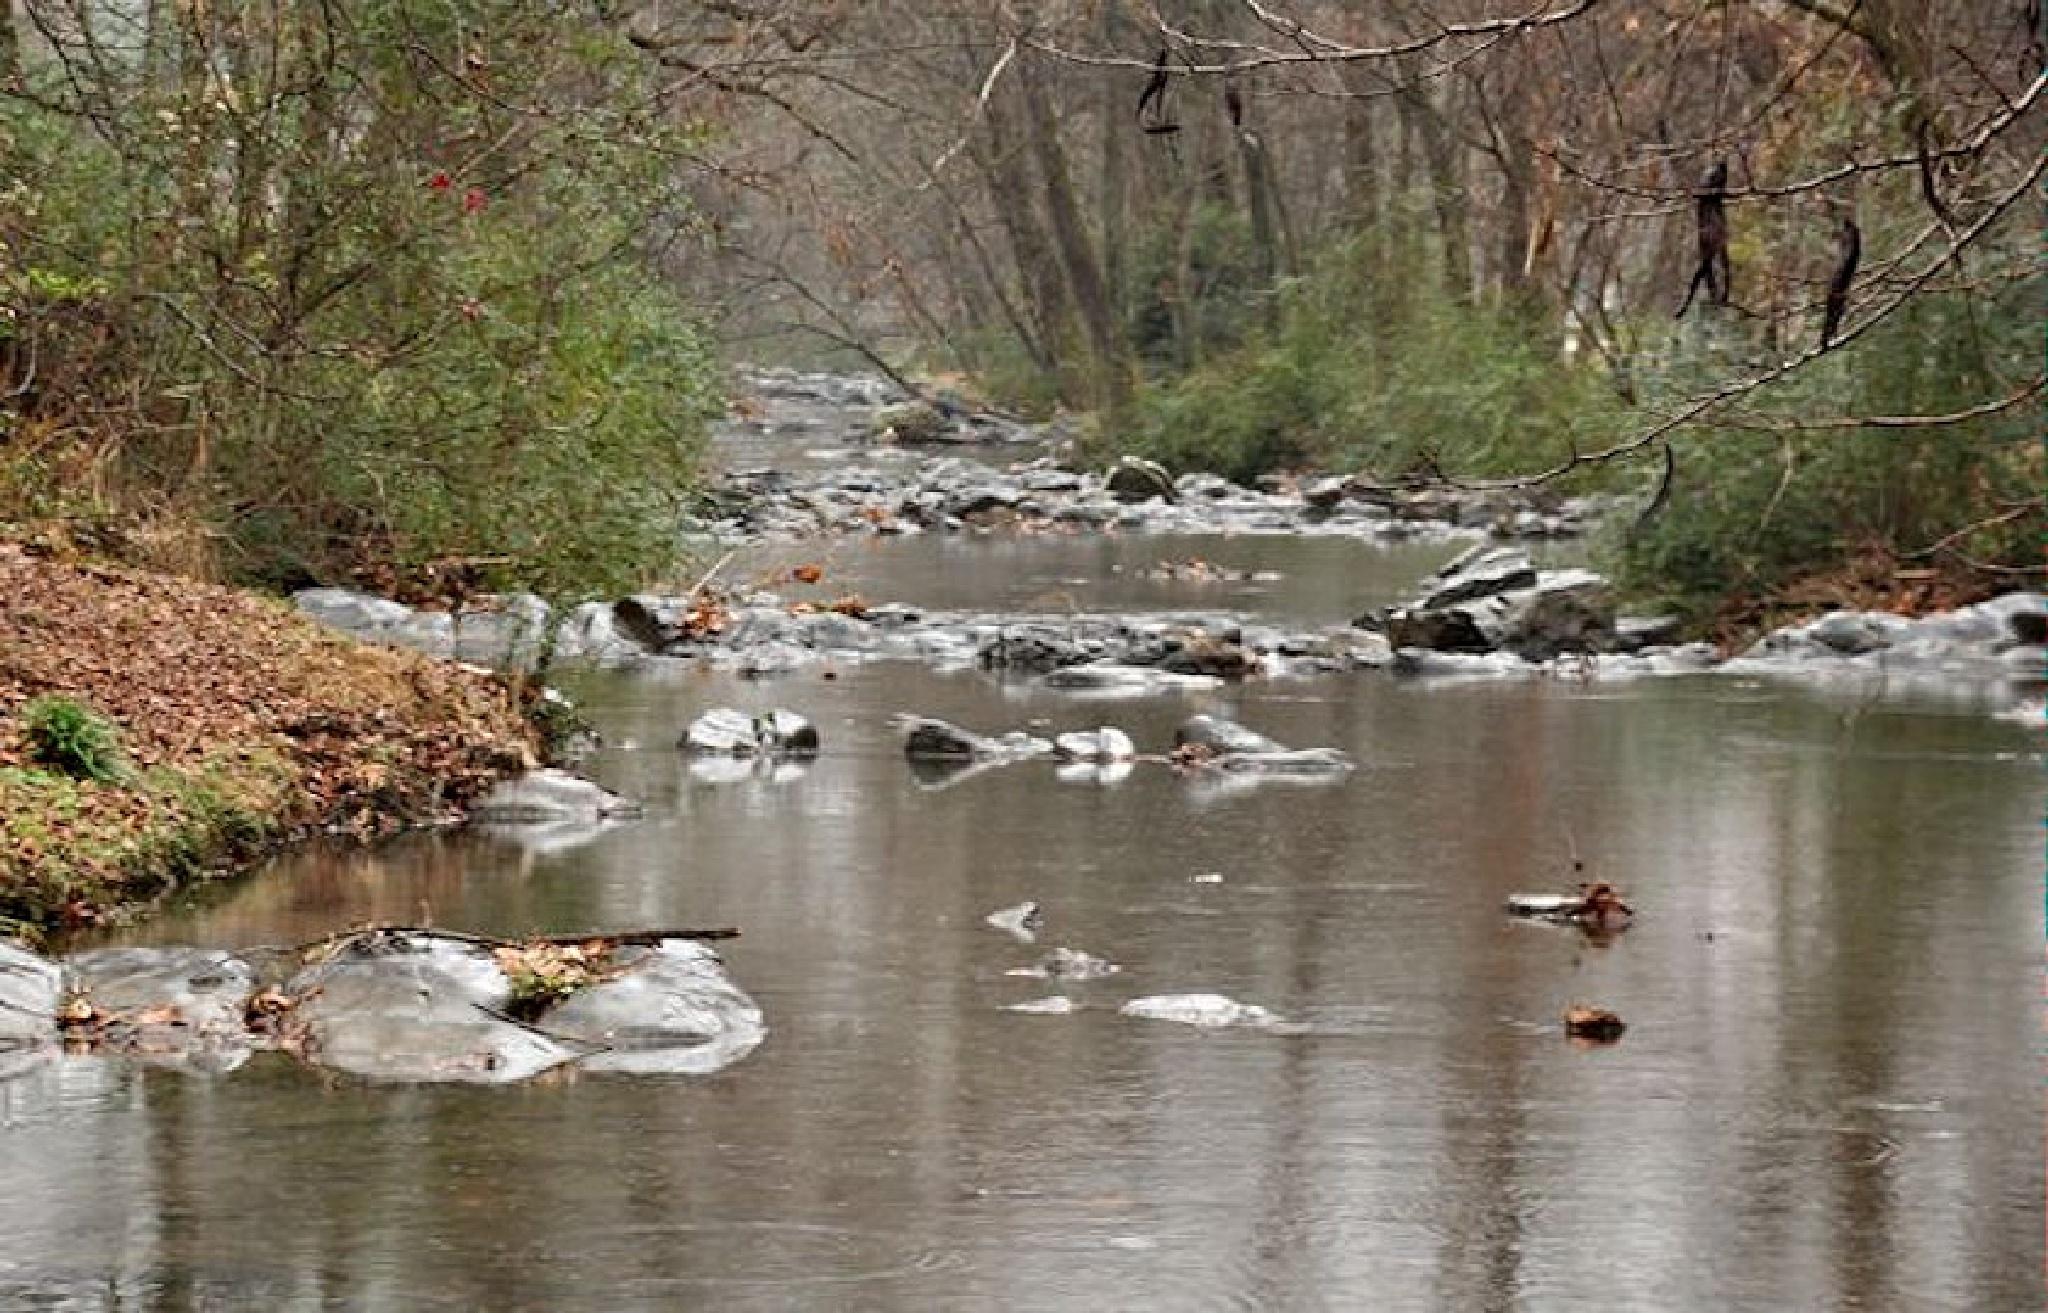 Up the Creek by dubblybubbly51